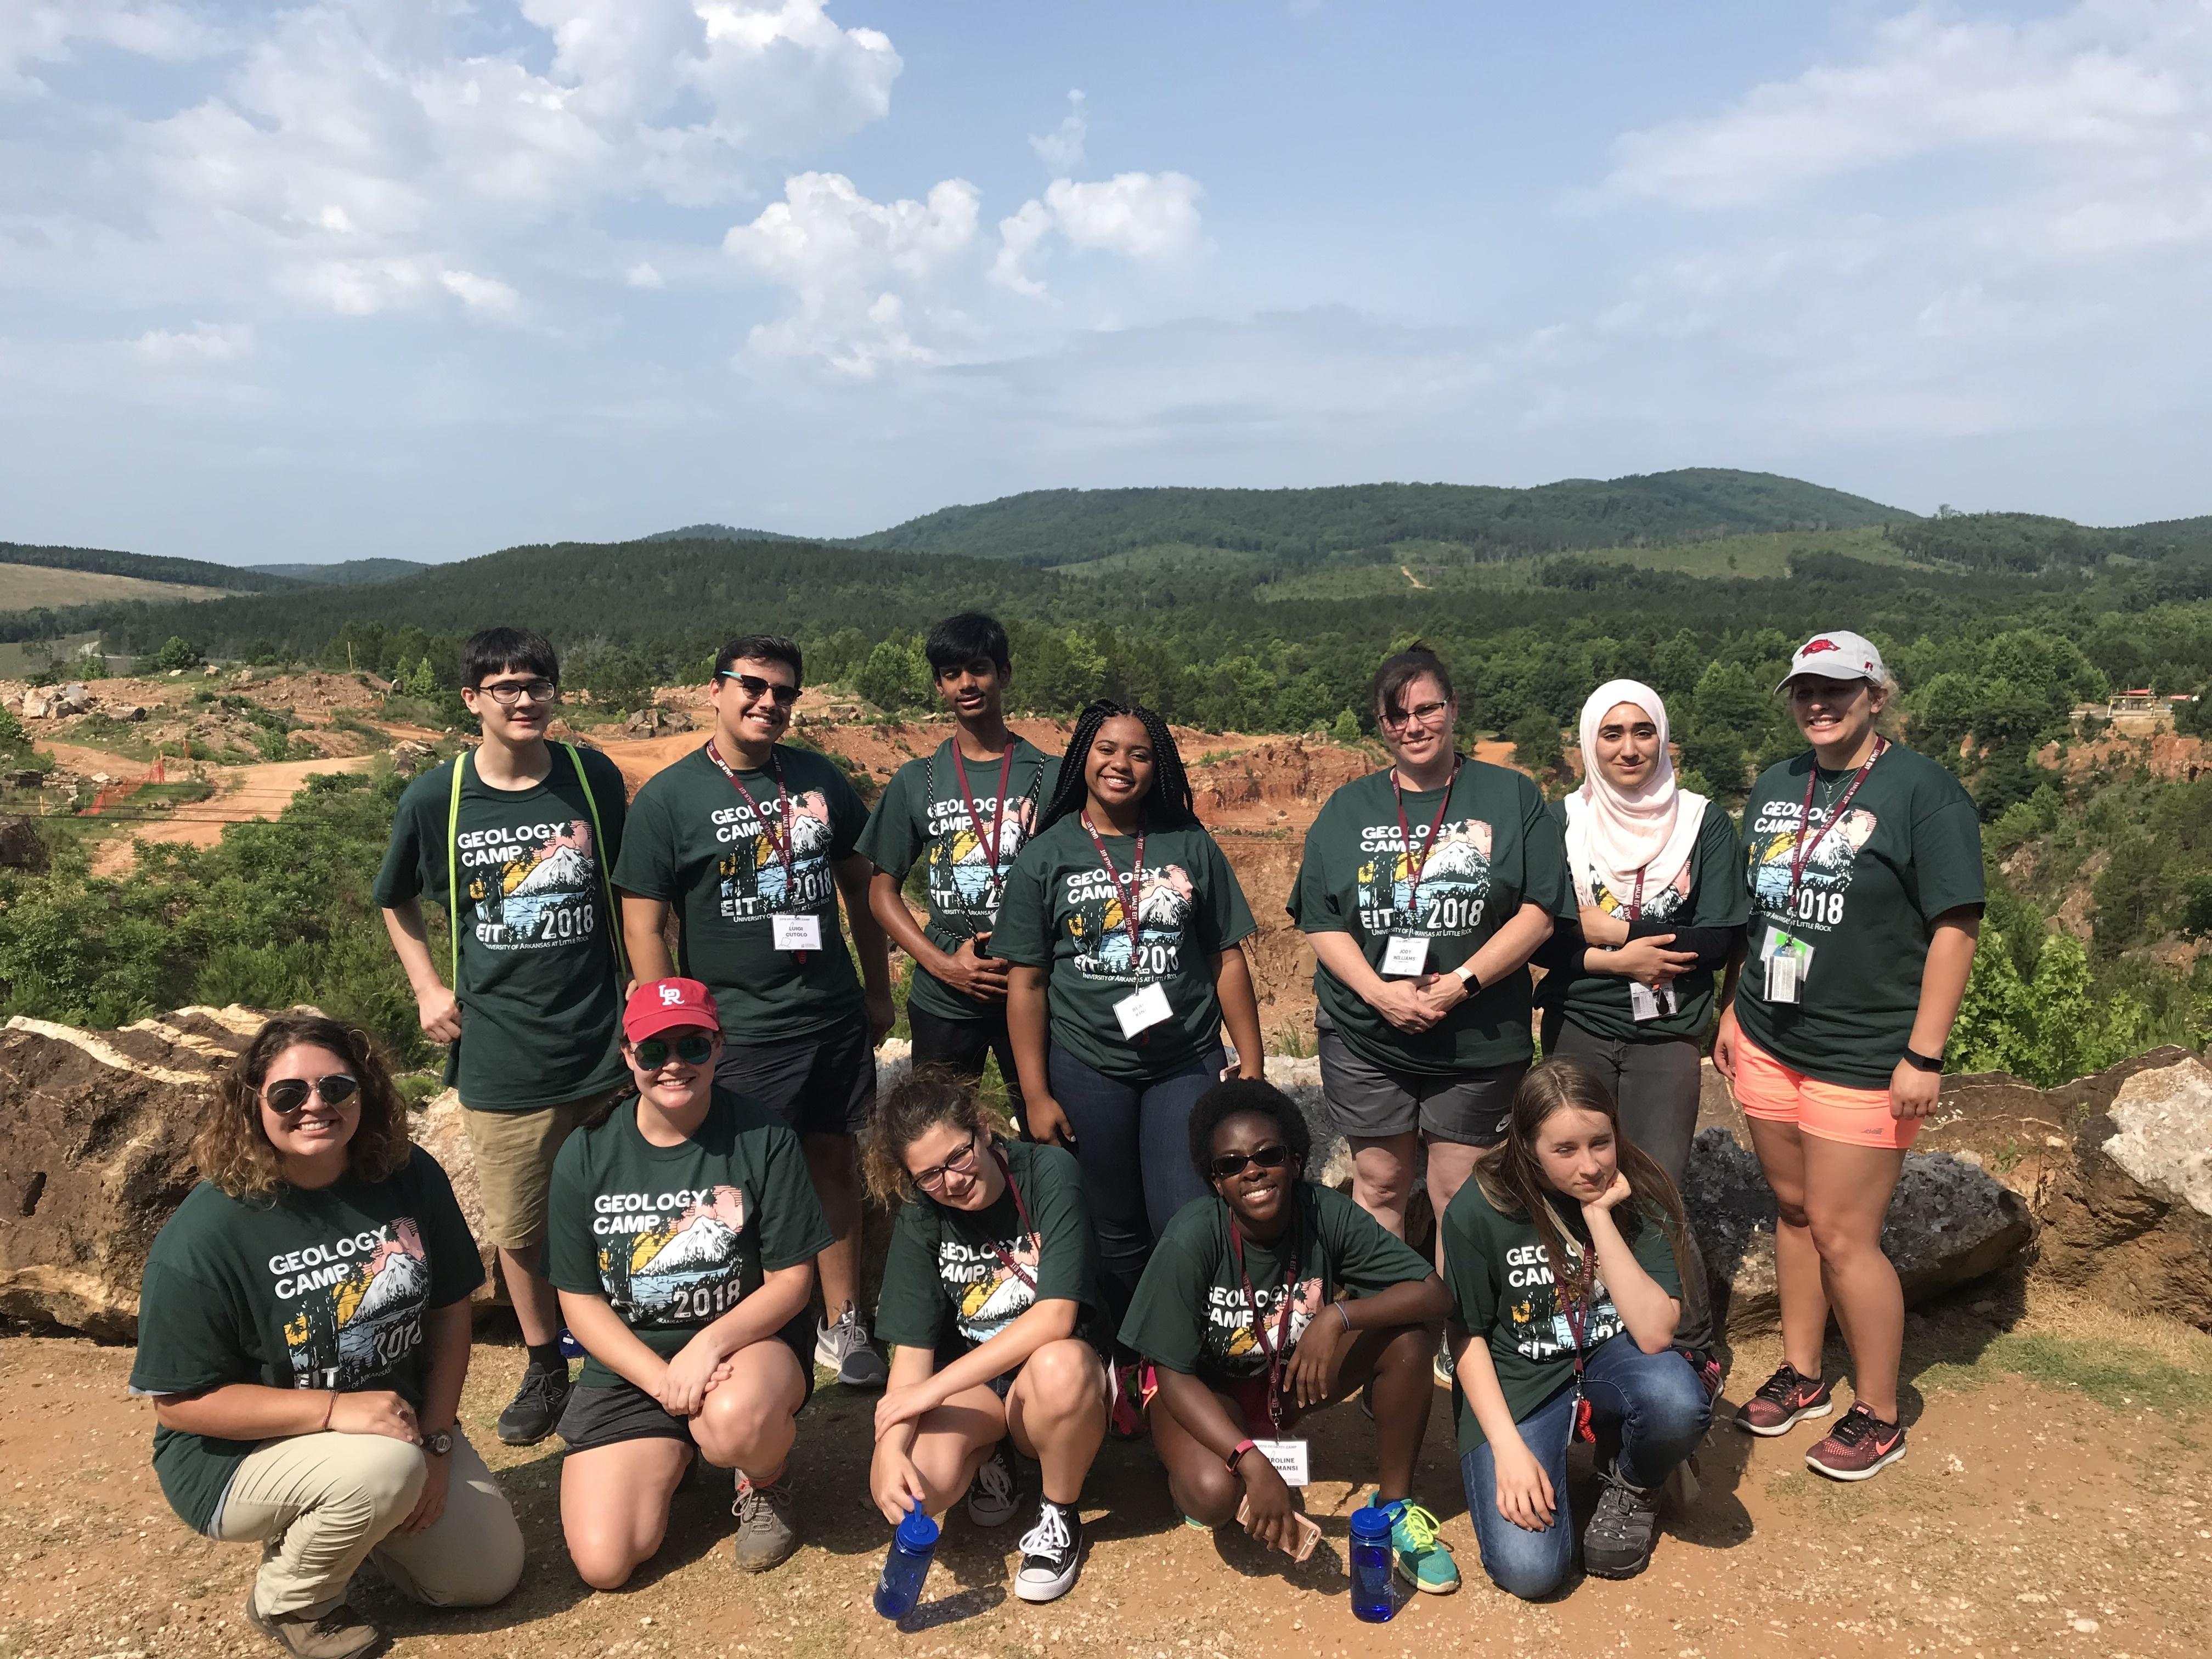 Geology camp